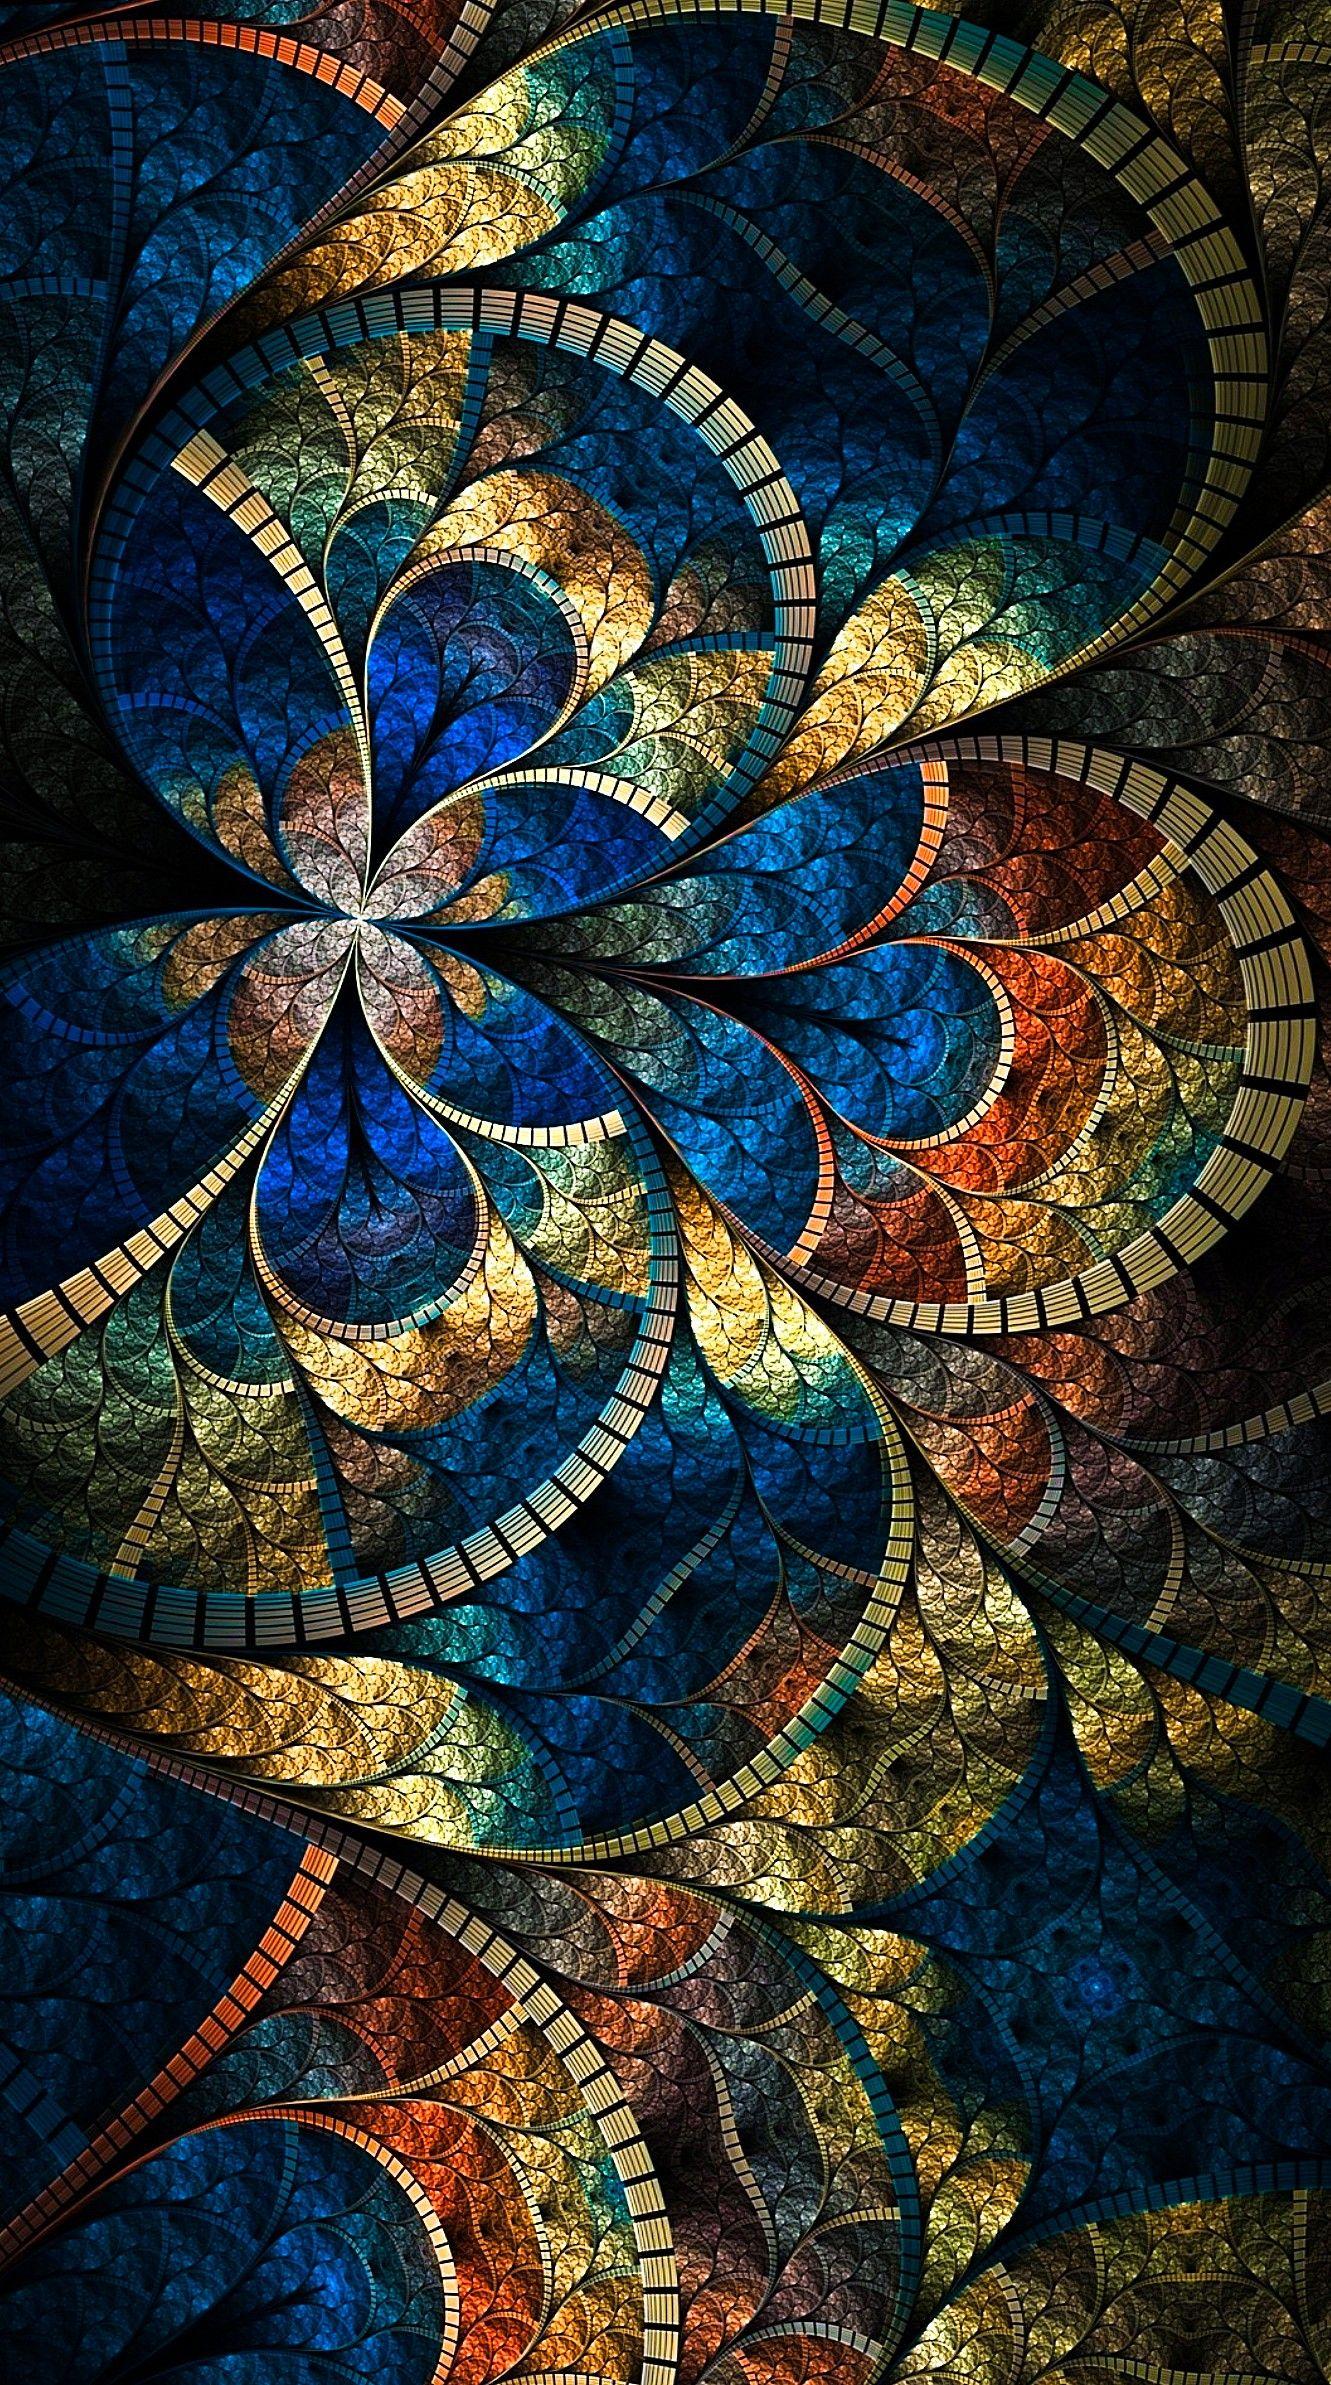 Blue And Gold Kaleidoscope Mandala Wallpaper Mandala Wallpaper Iphone Wallpaper Tumblr Aesthetic Wallpapers Vintage